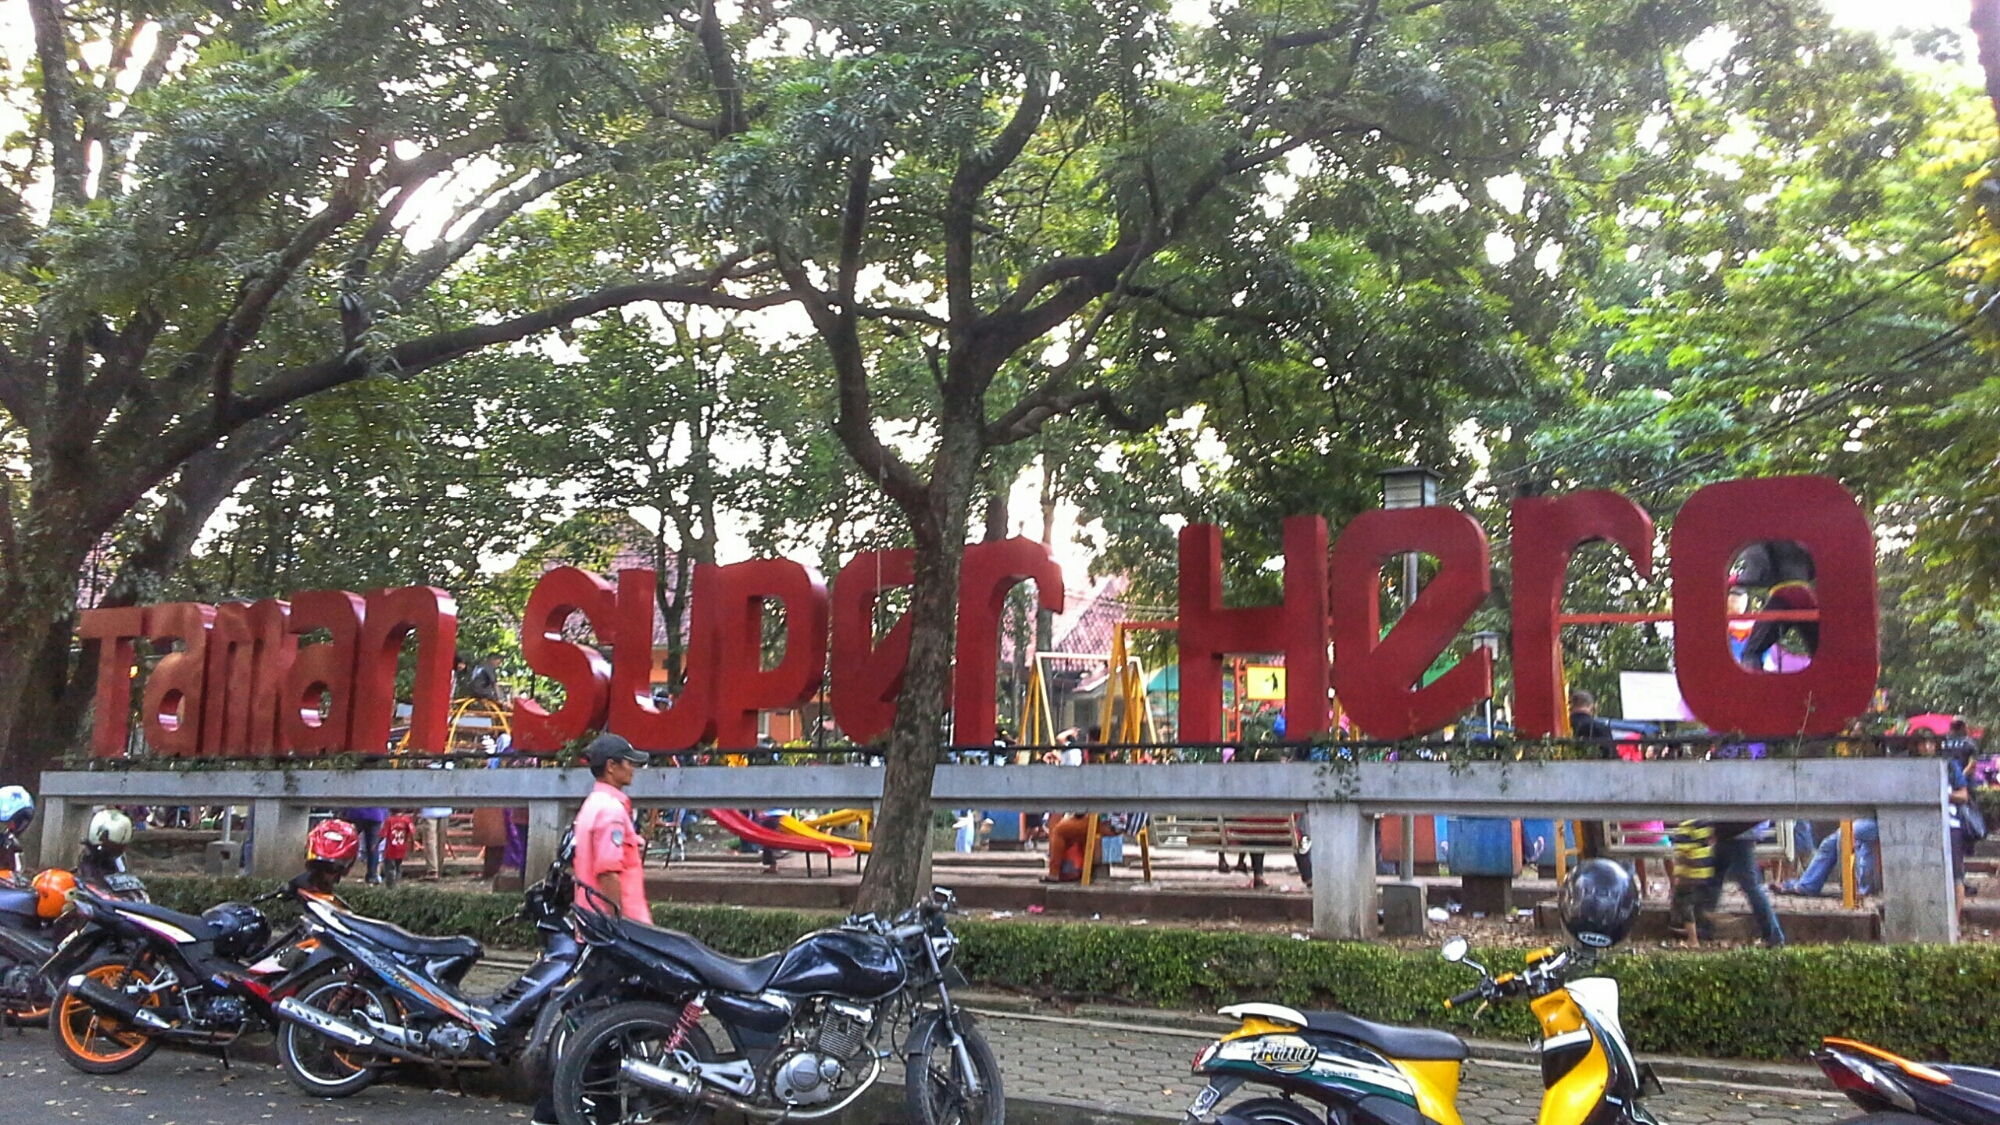 Pariwisata Ridwan Spektra Laman 2 Image Taman Lansia Kab Bandung